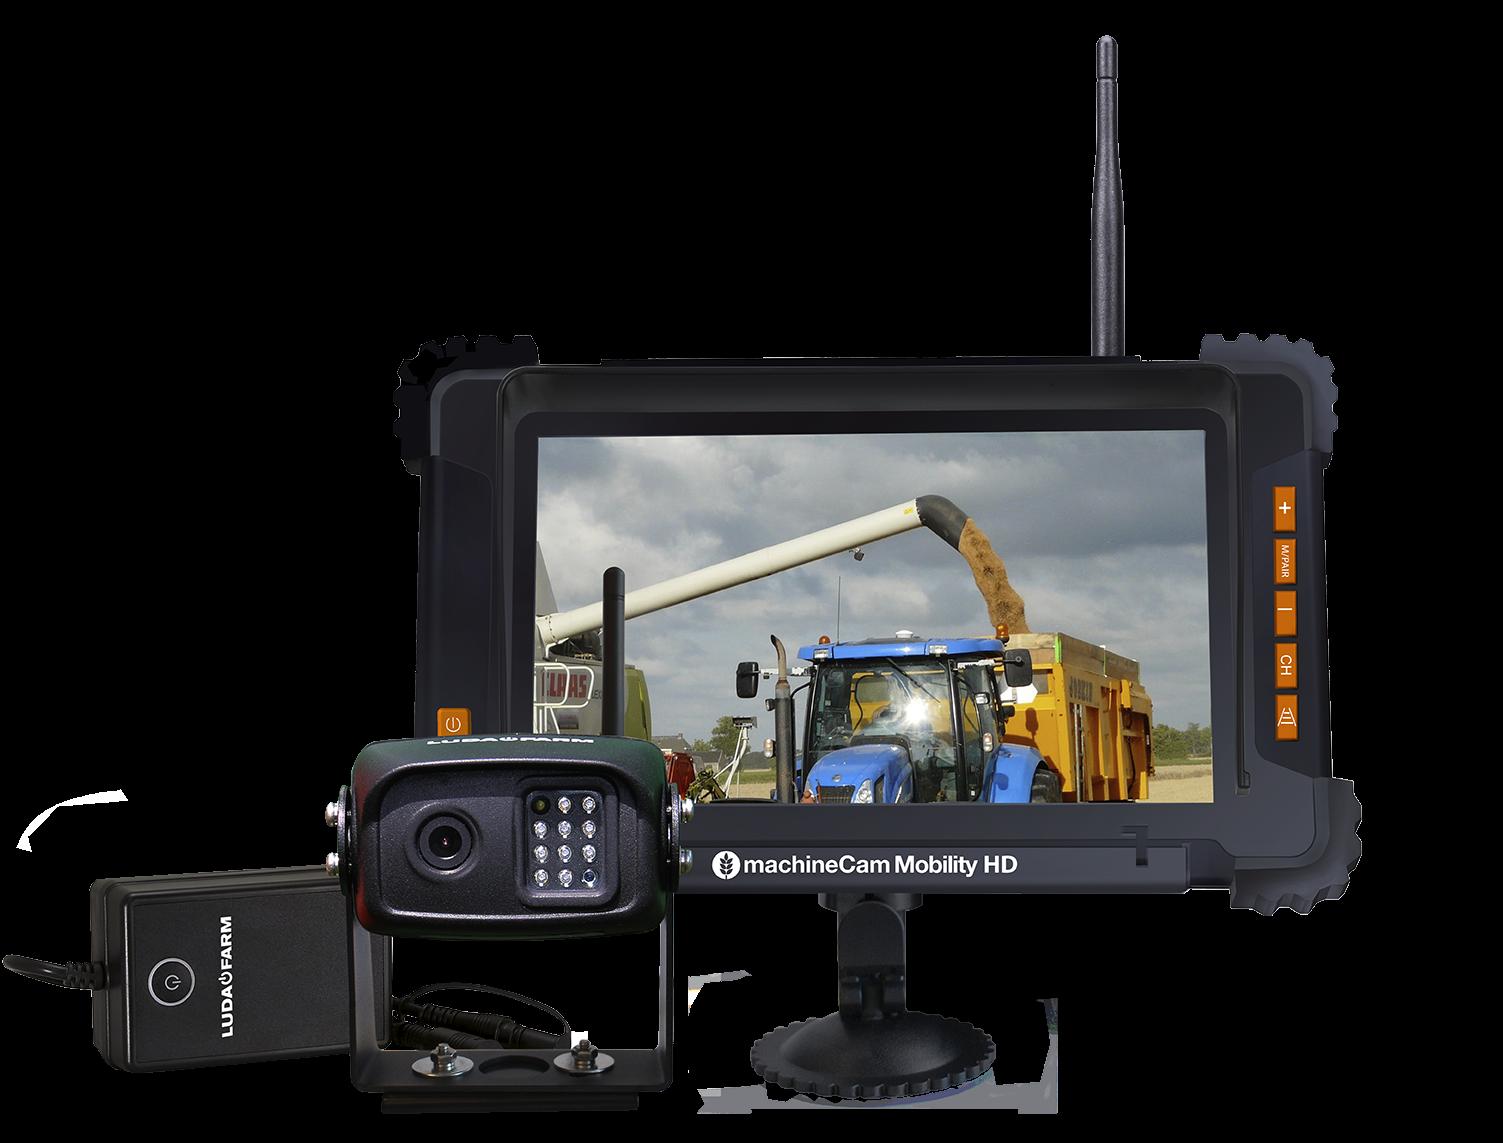 Kit Caméra de recul sans fil MachineCam Mobility HD - Luda Farm